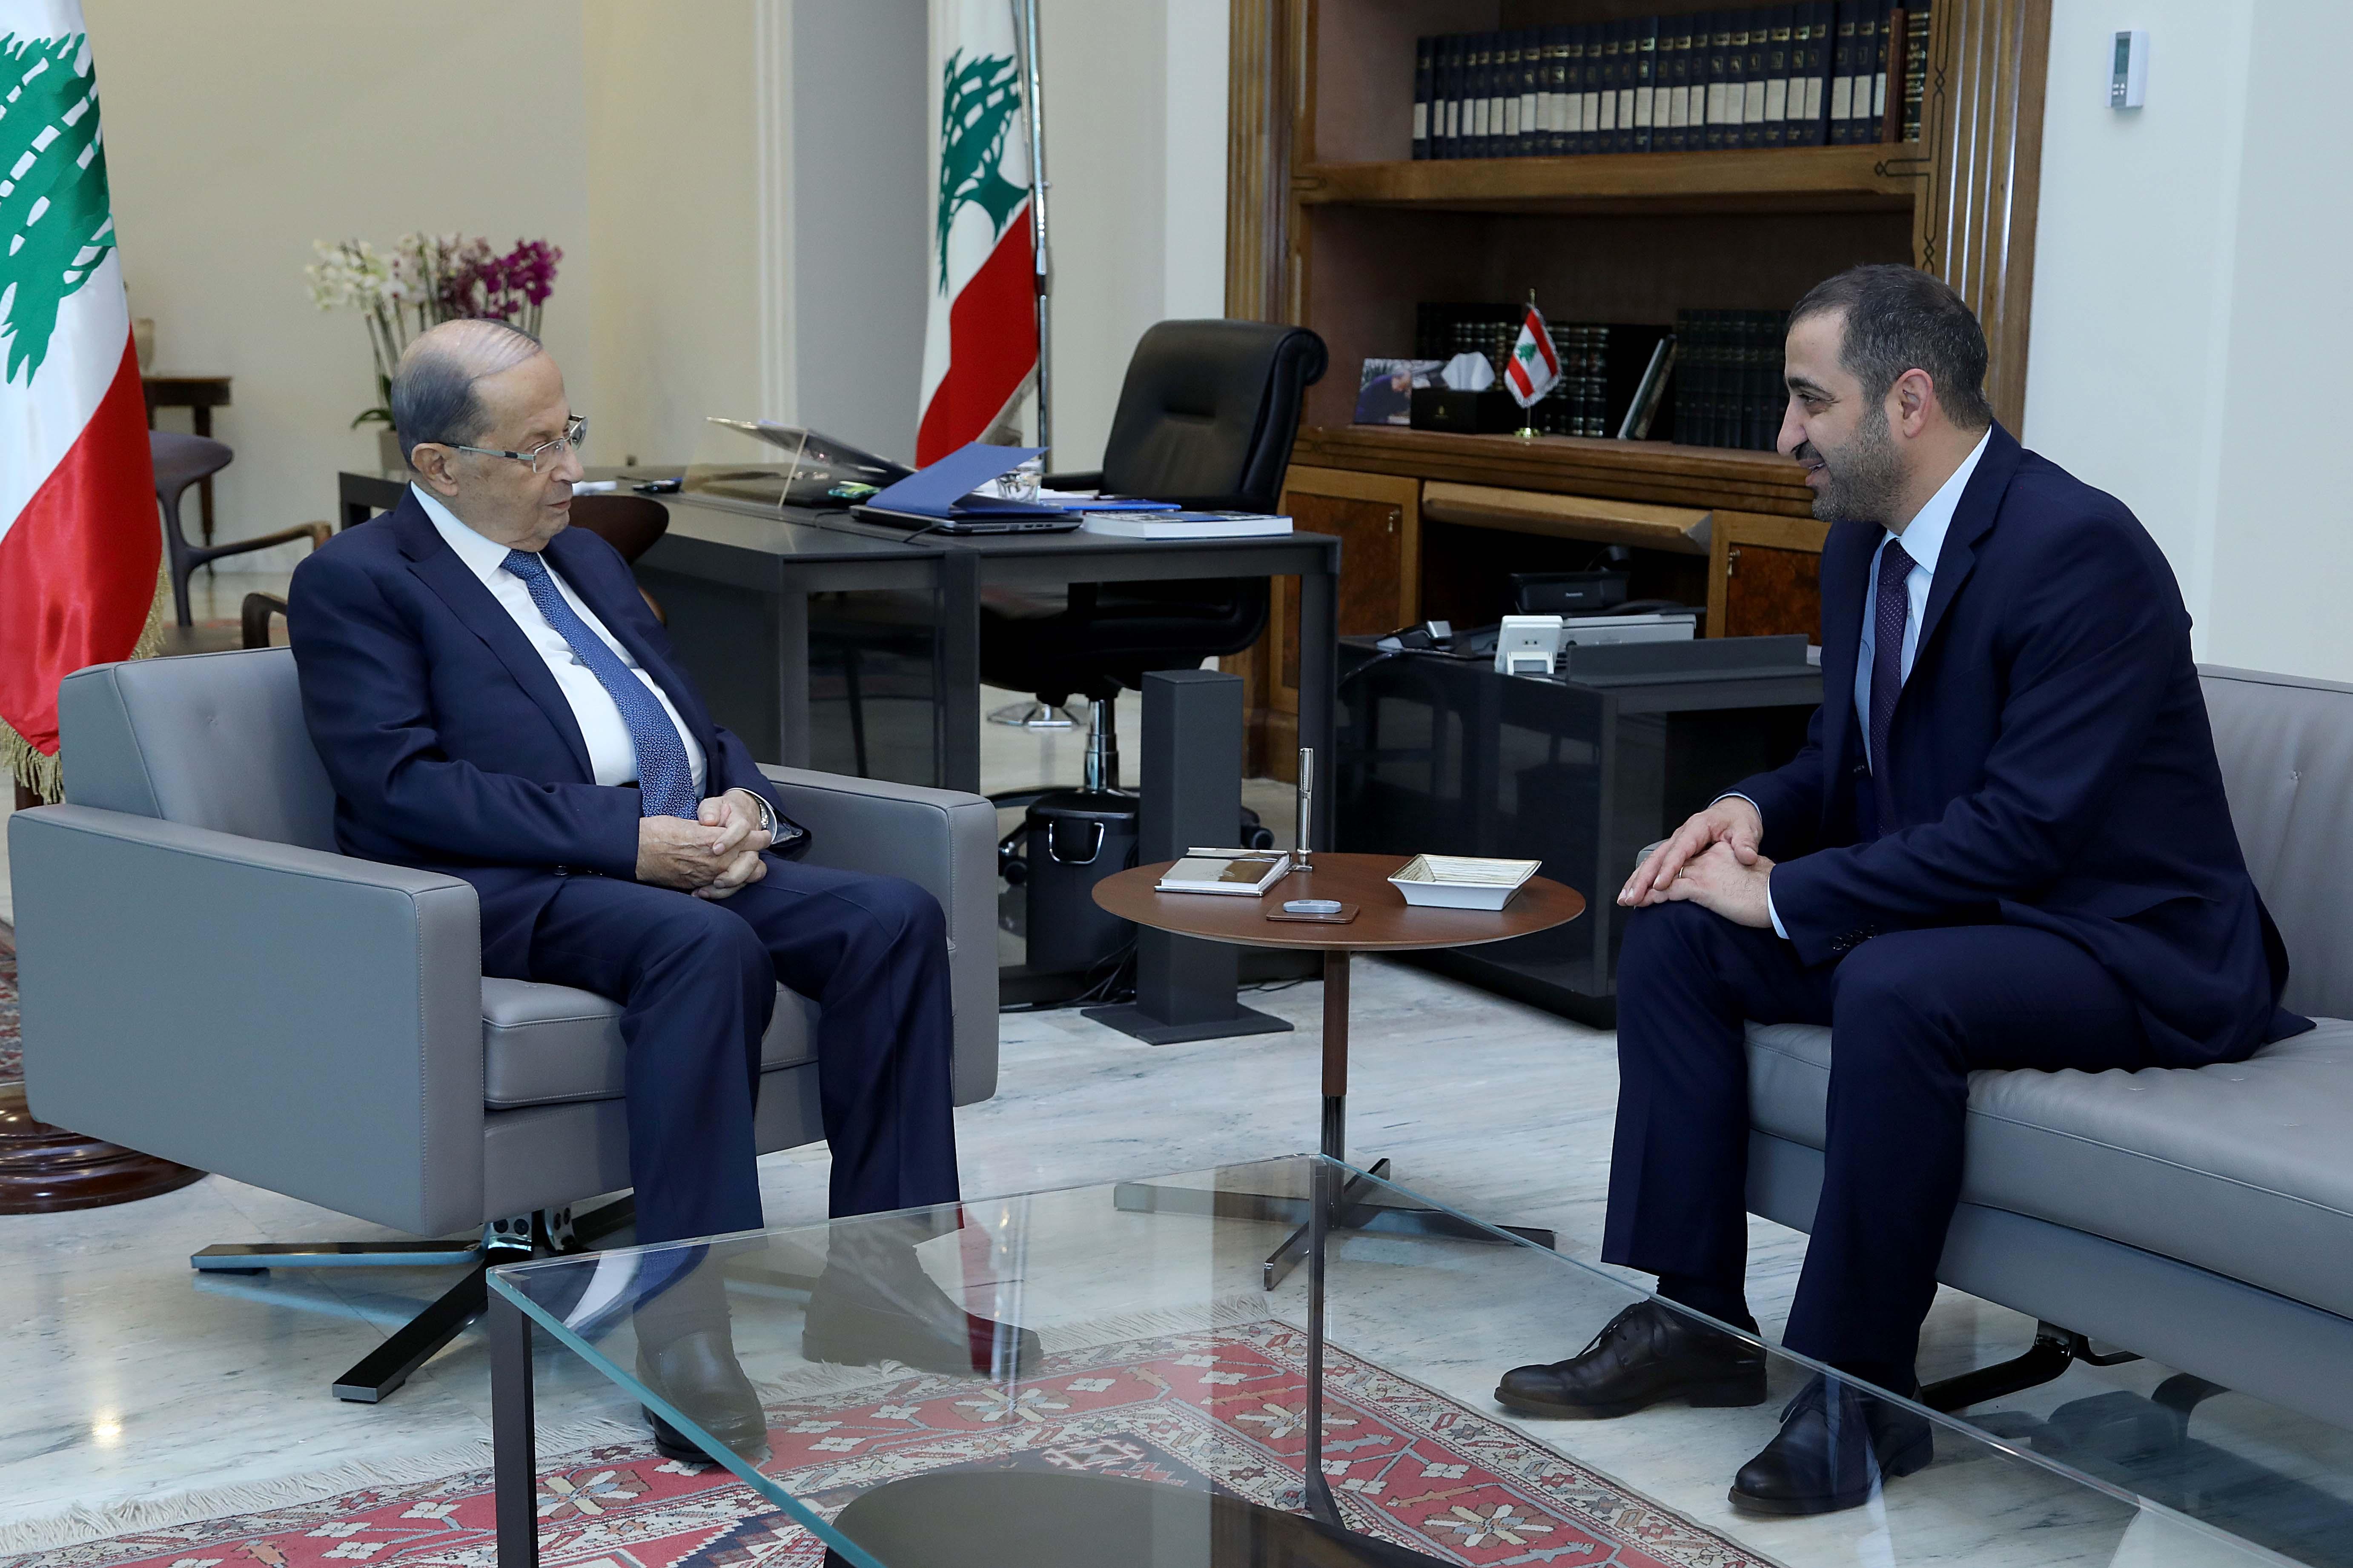 2 -Minister Ghassan Atallah